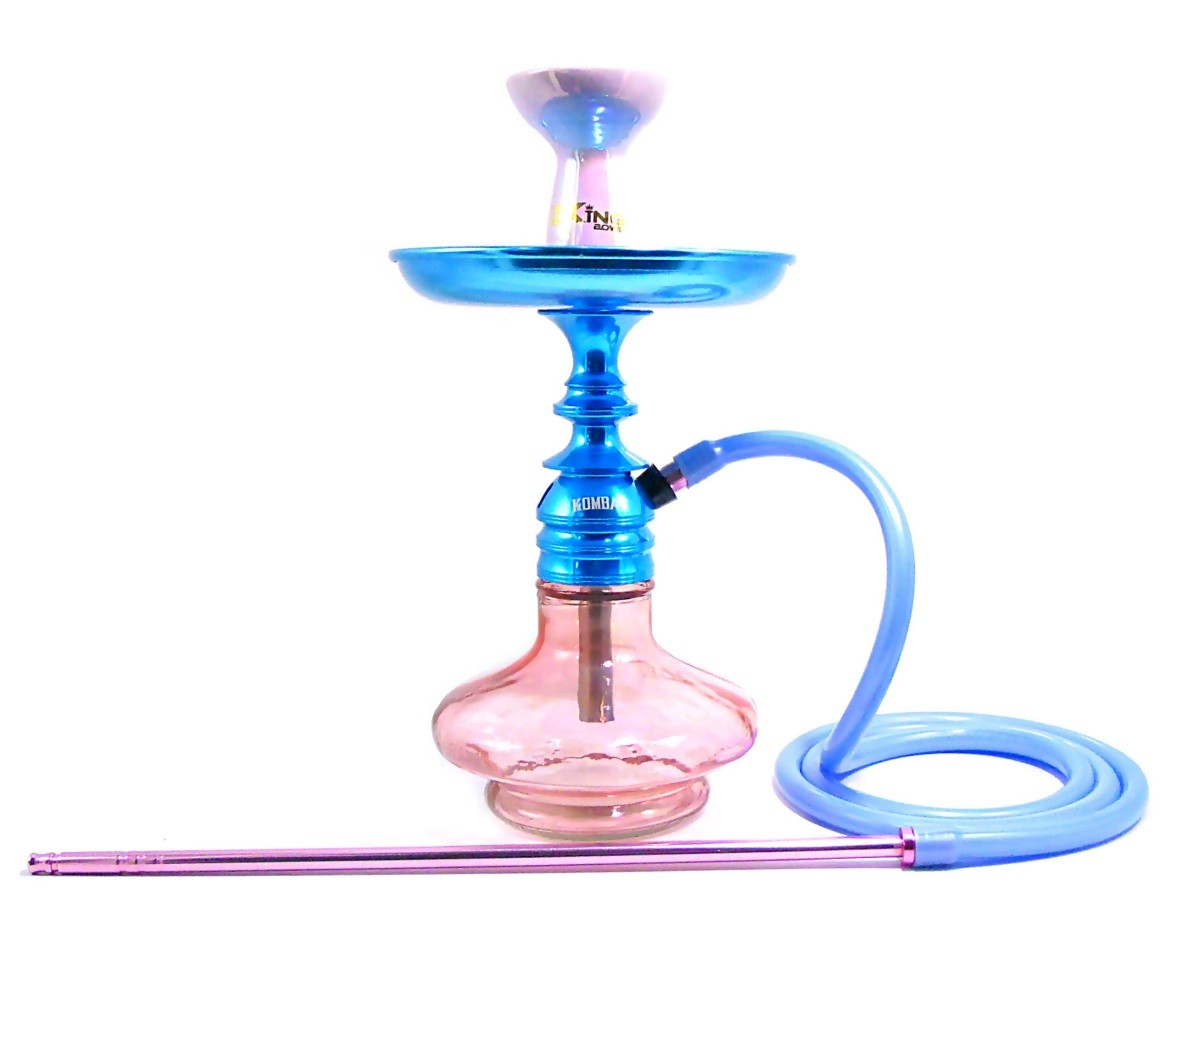 Narguile Amazon Kombat Azul, vaso Aladin Rosé, mangueira silicone, piteira alumínio, rosh B-King, prato DM azul